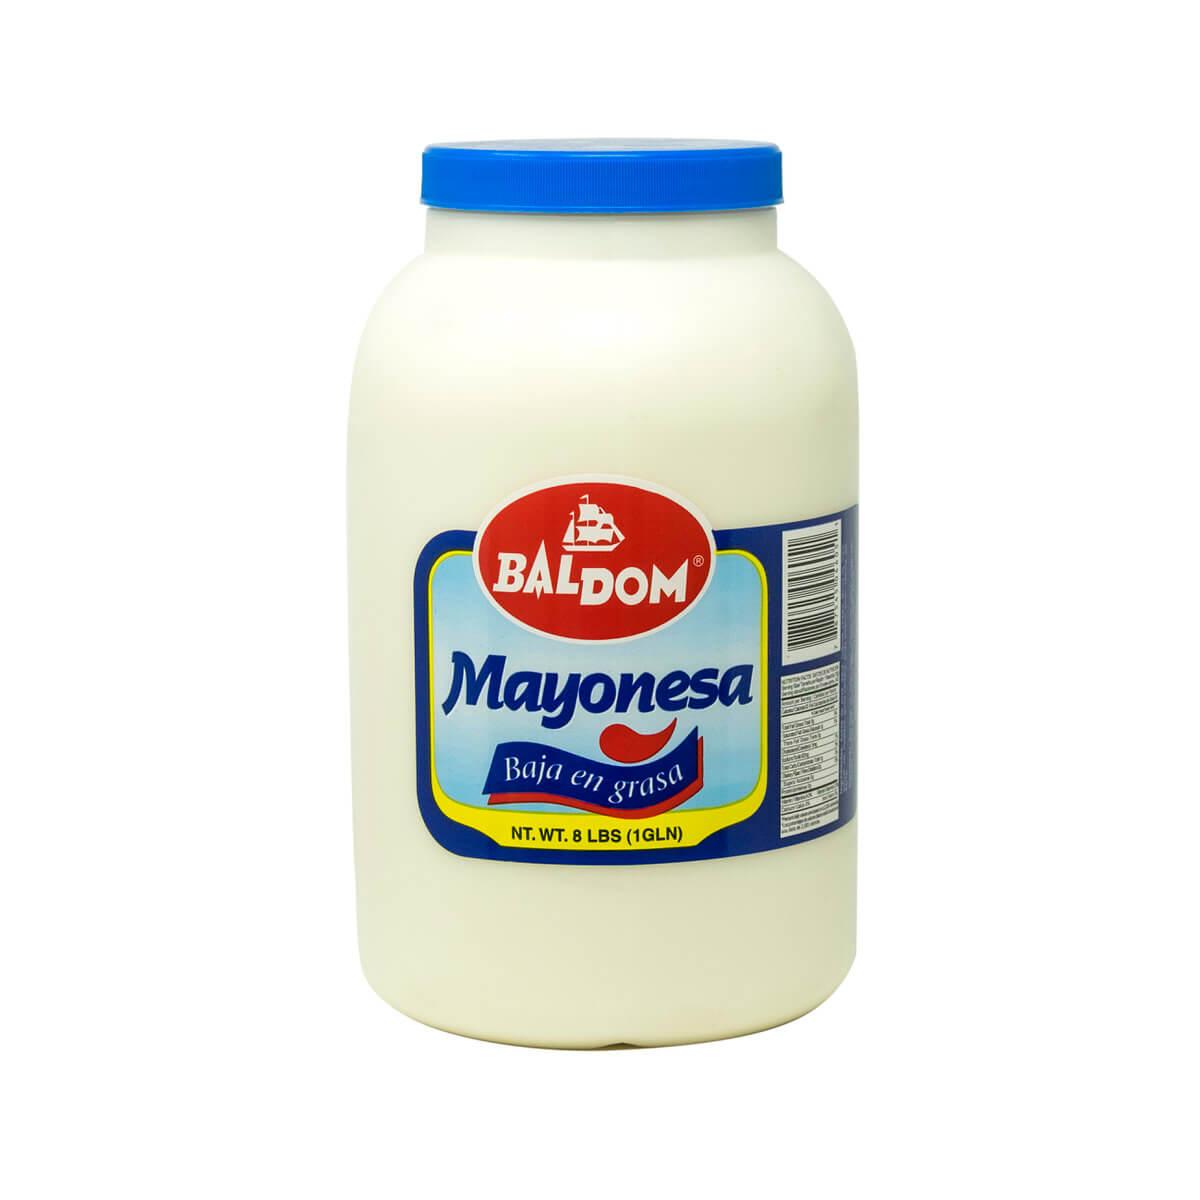 Mayonesa baja en grasa